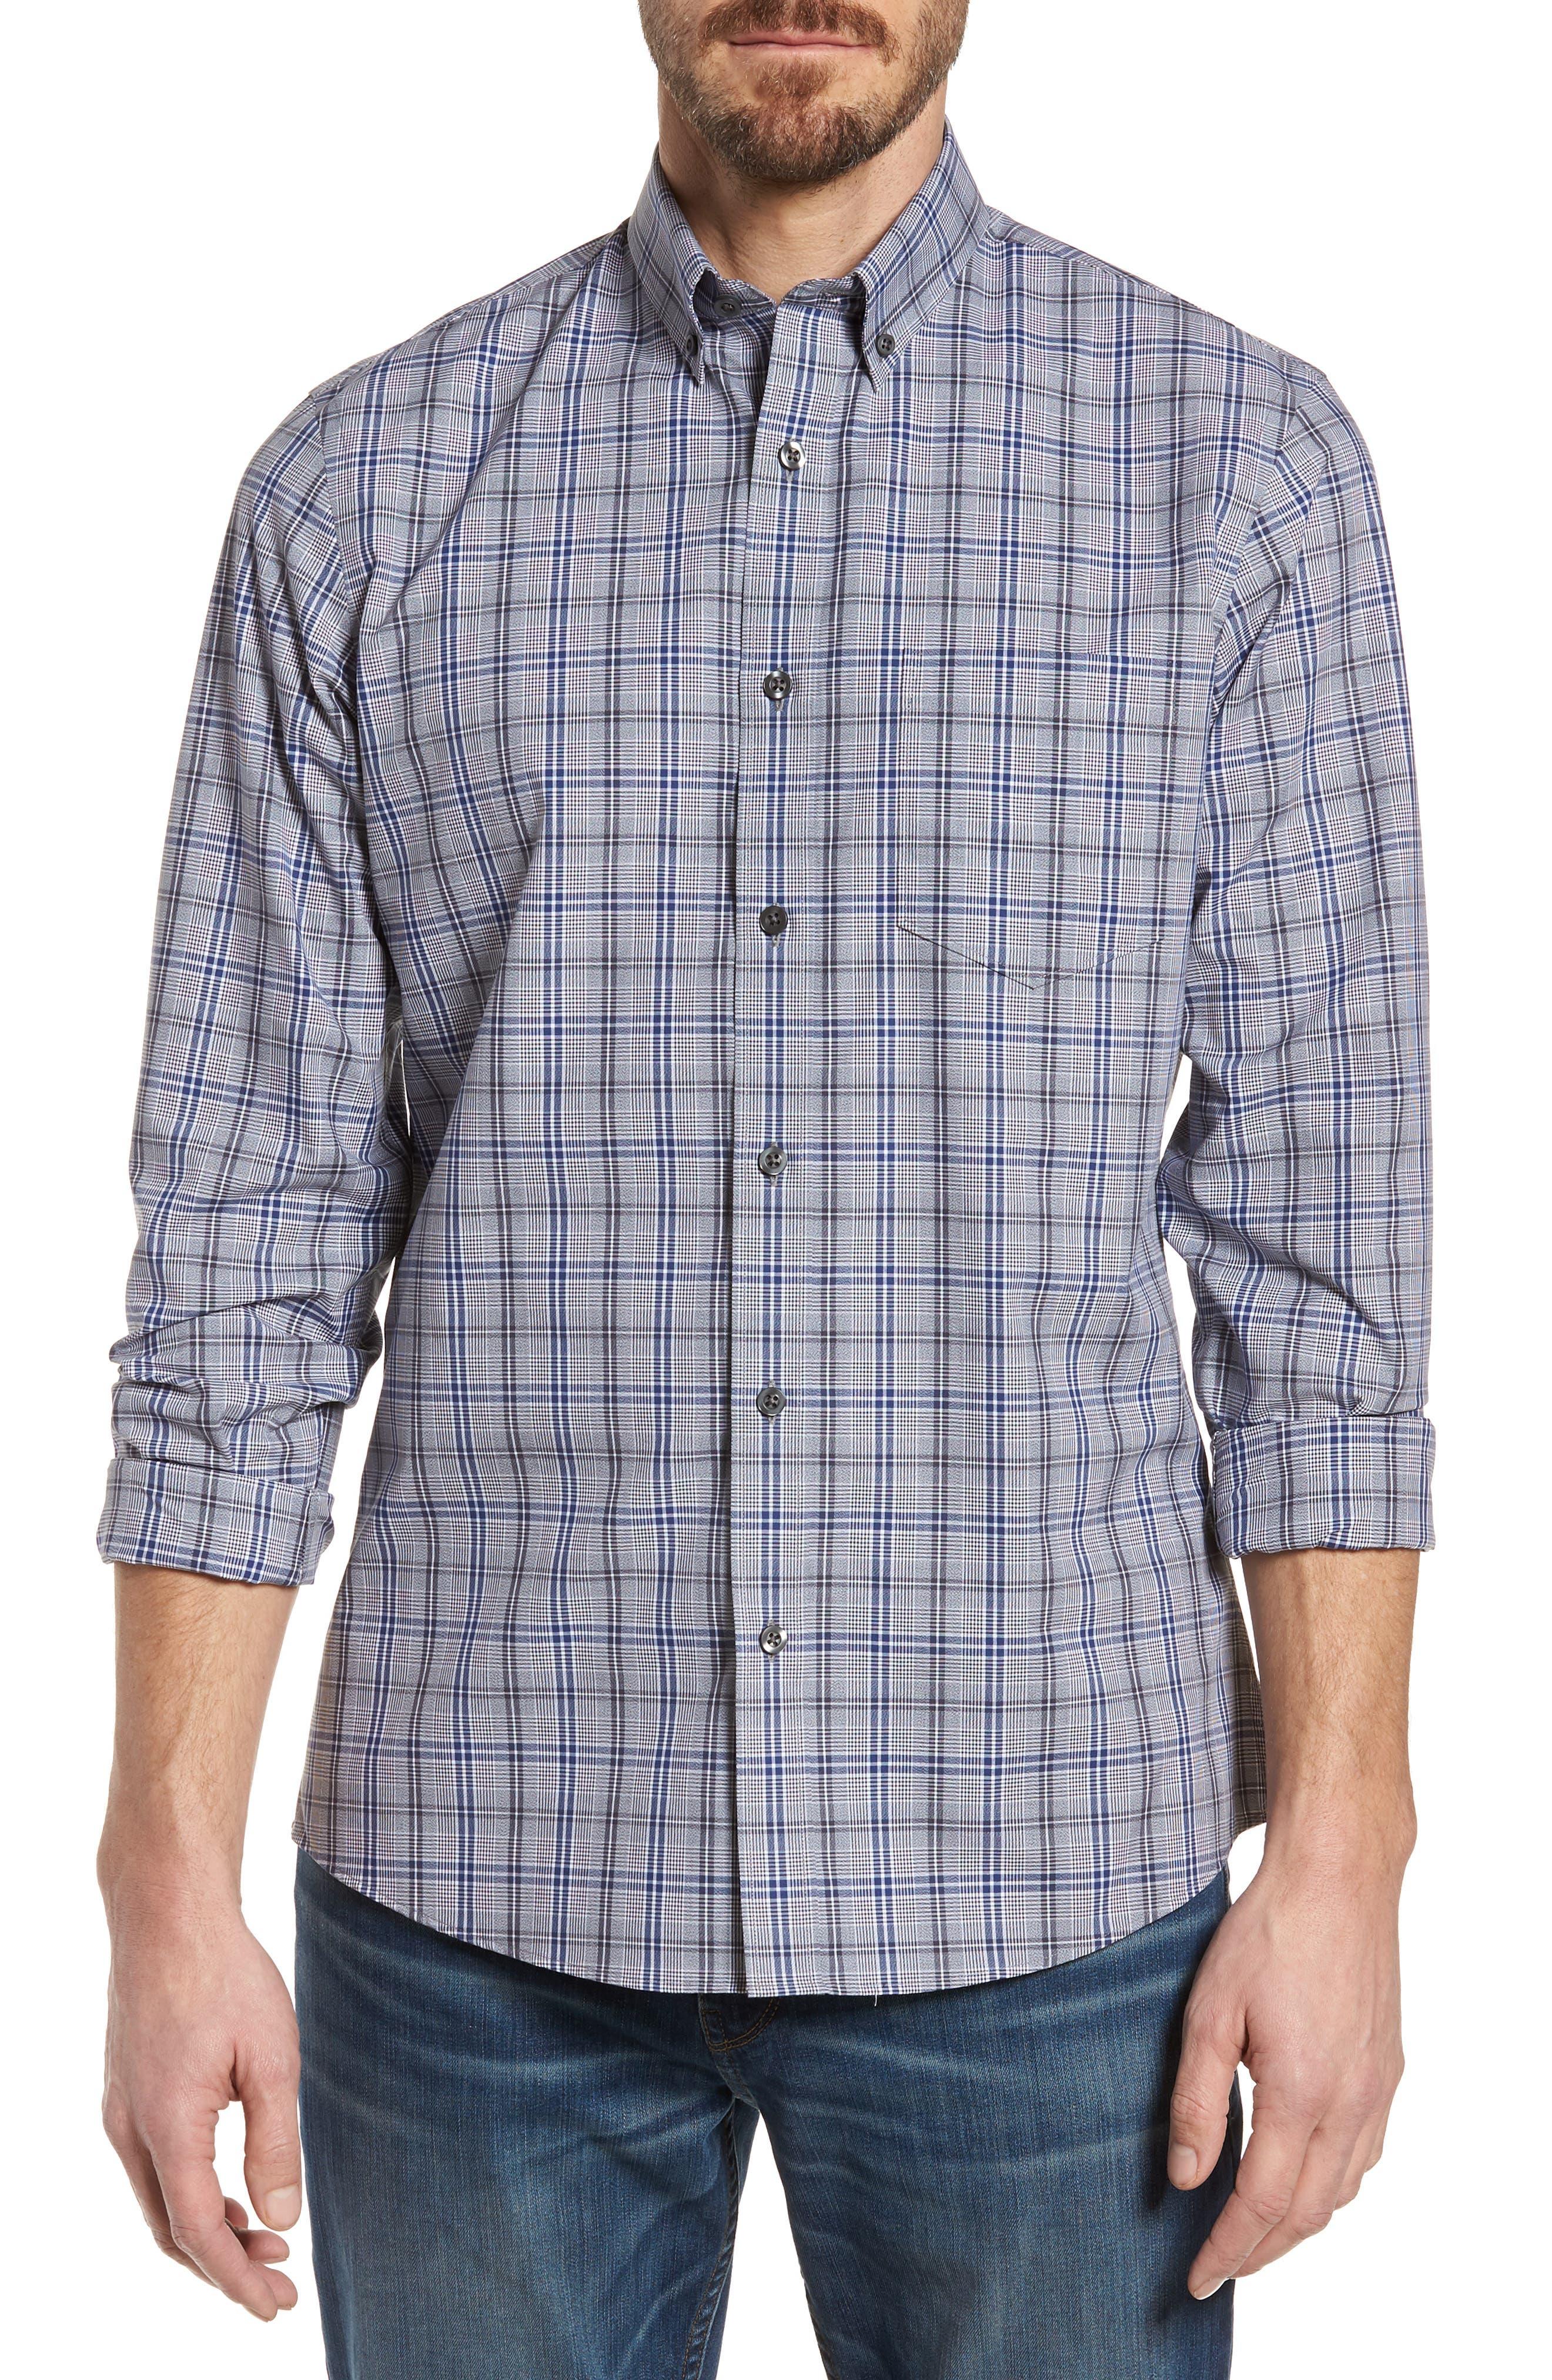 Alternate Image 1 Selected - Nordstrom Men's Shop Trim Fit Non-Iron Check Sport Shirt